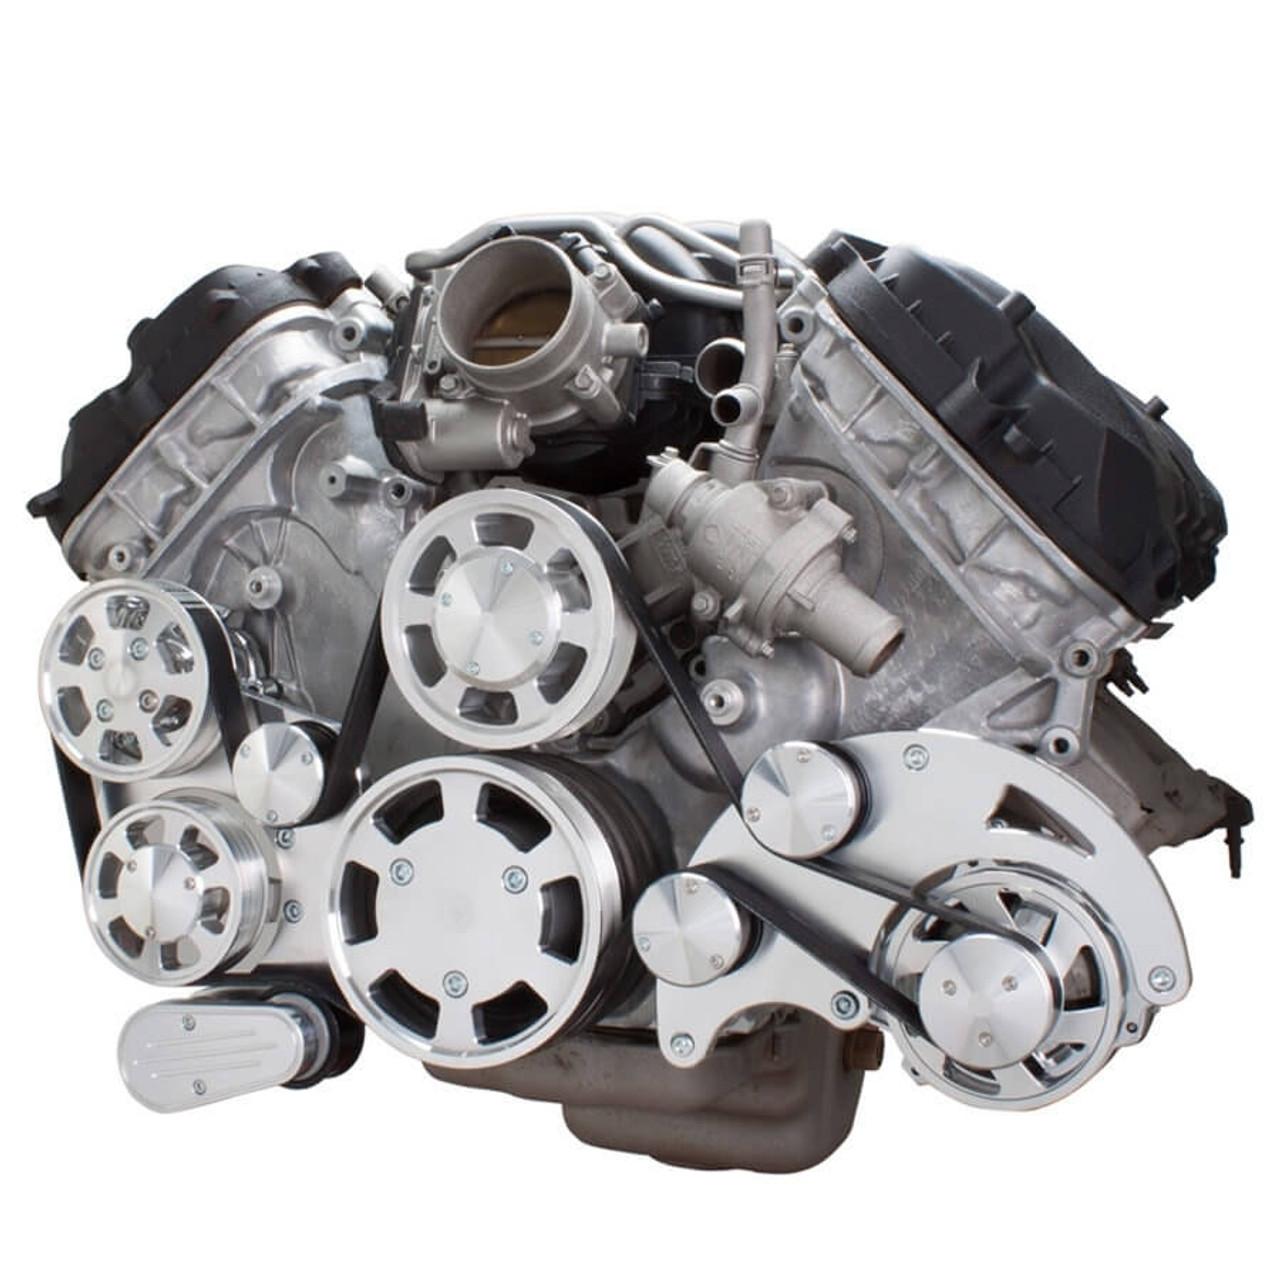 medium resolution of serpentine system for ford coyote 5 0 alternator power steering